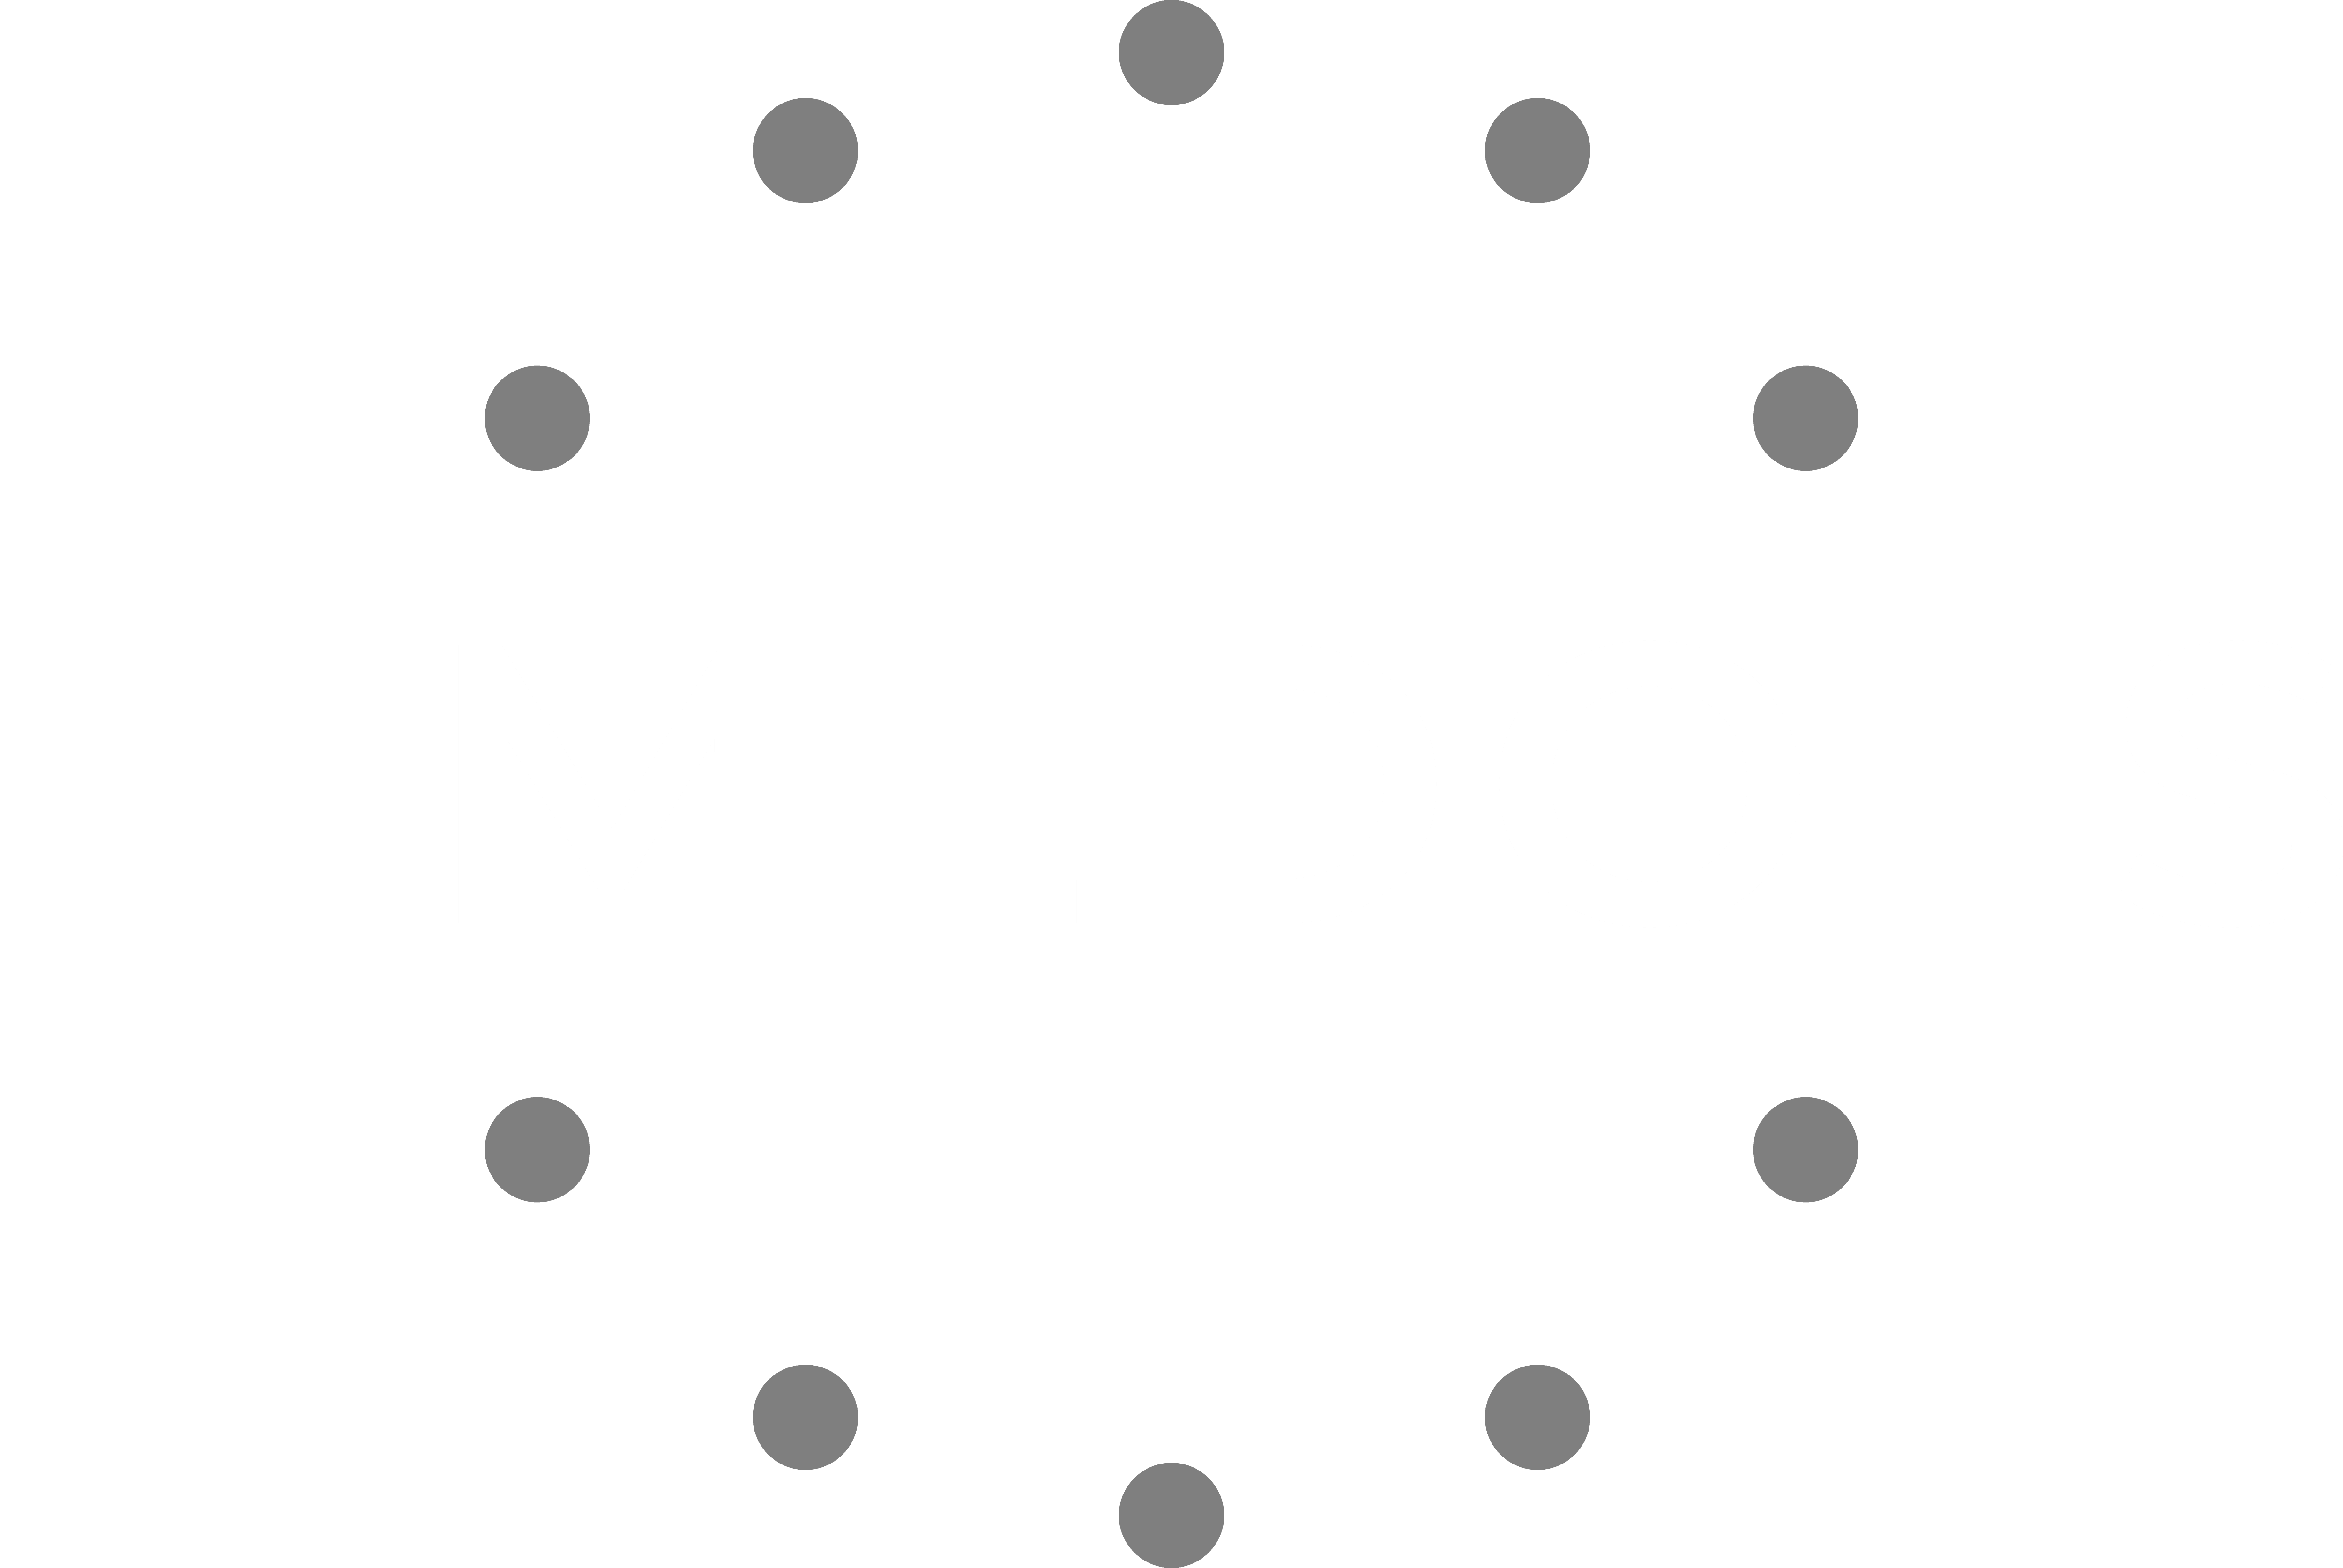 Timedots